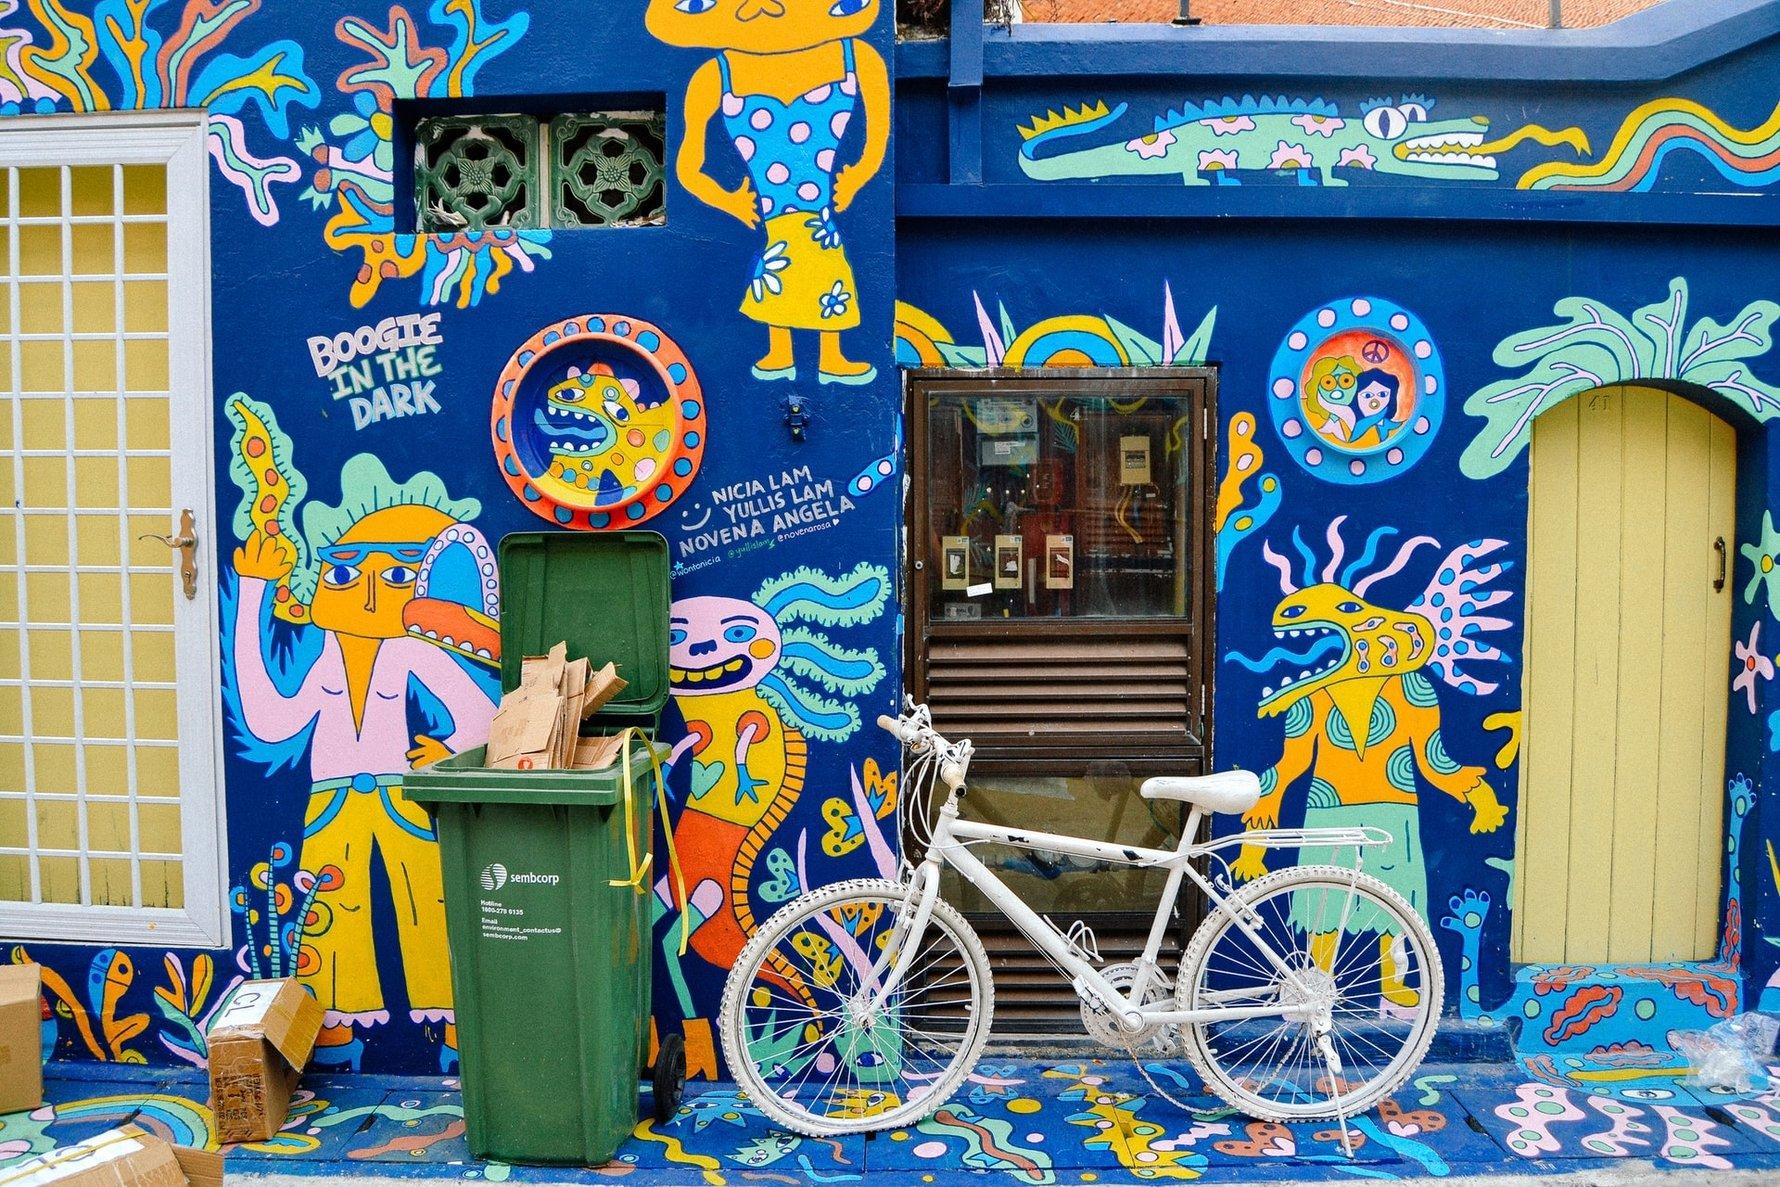 24 Hours in Singapore - Kampong Glam © thyla-jane, unsplash